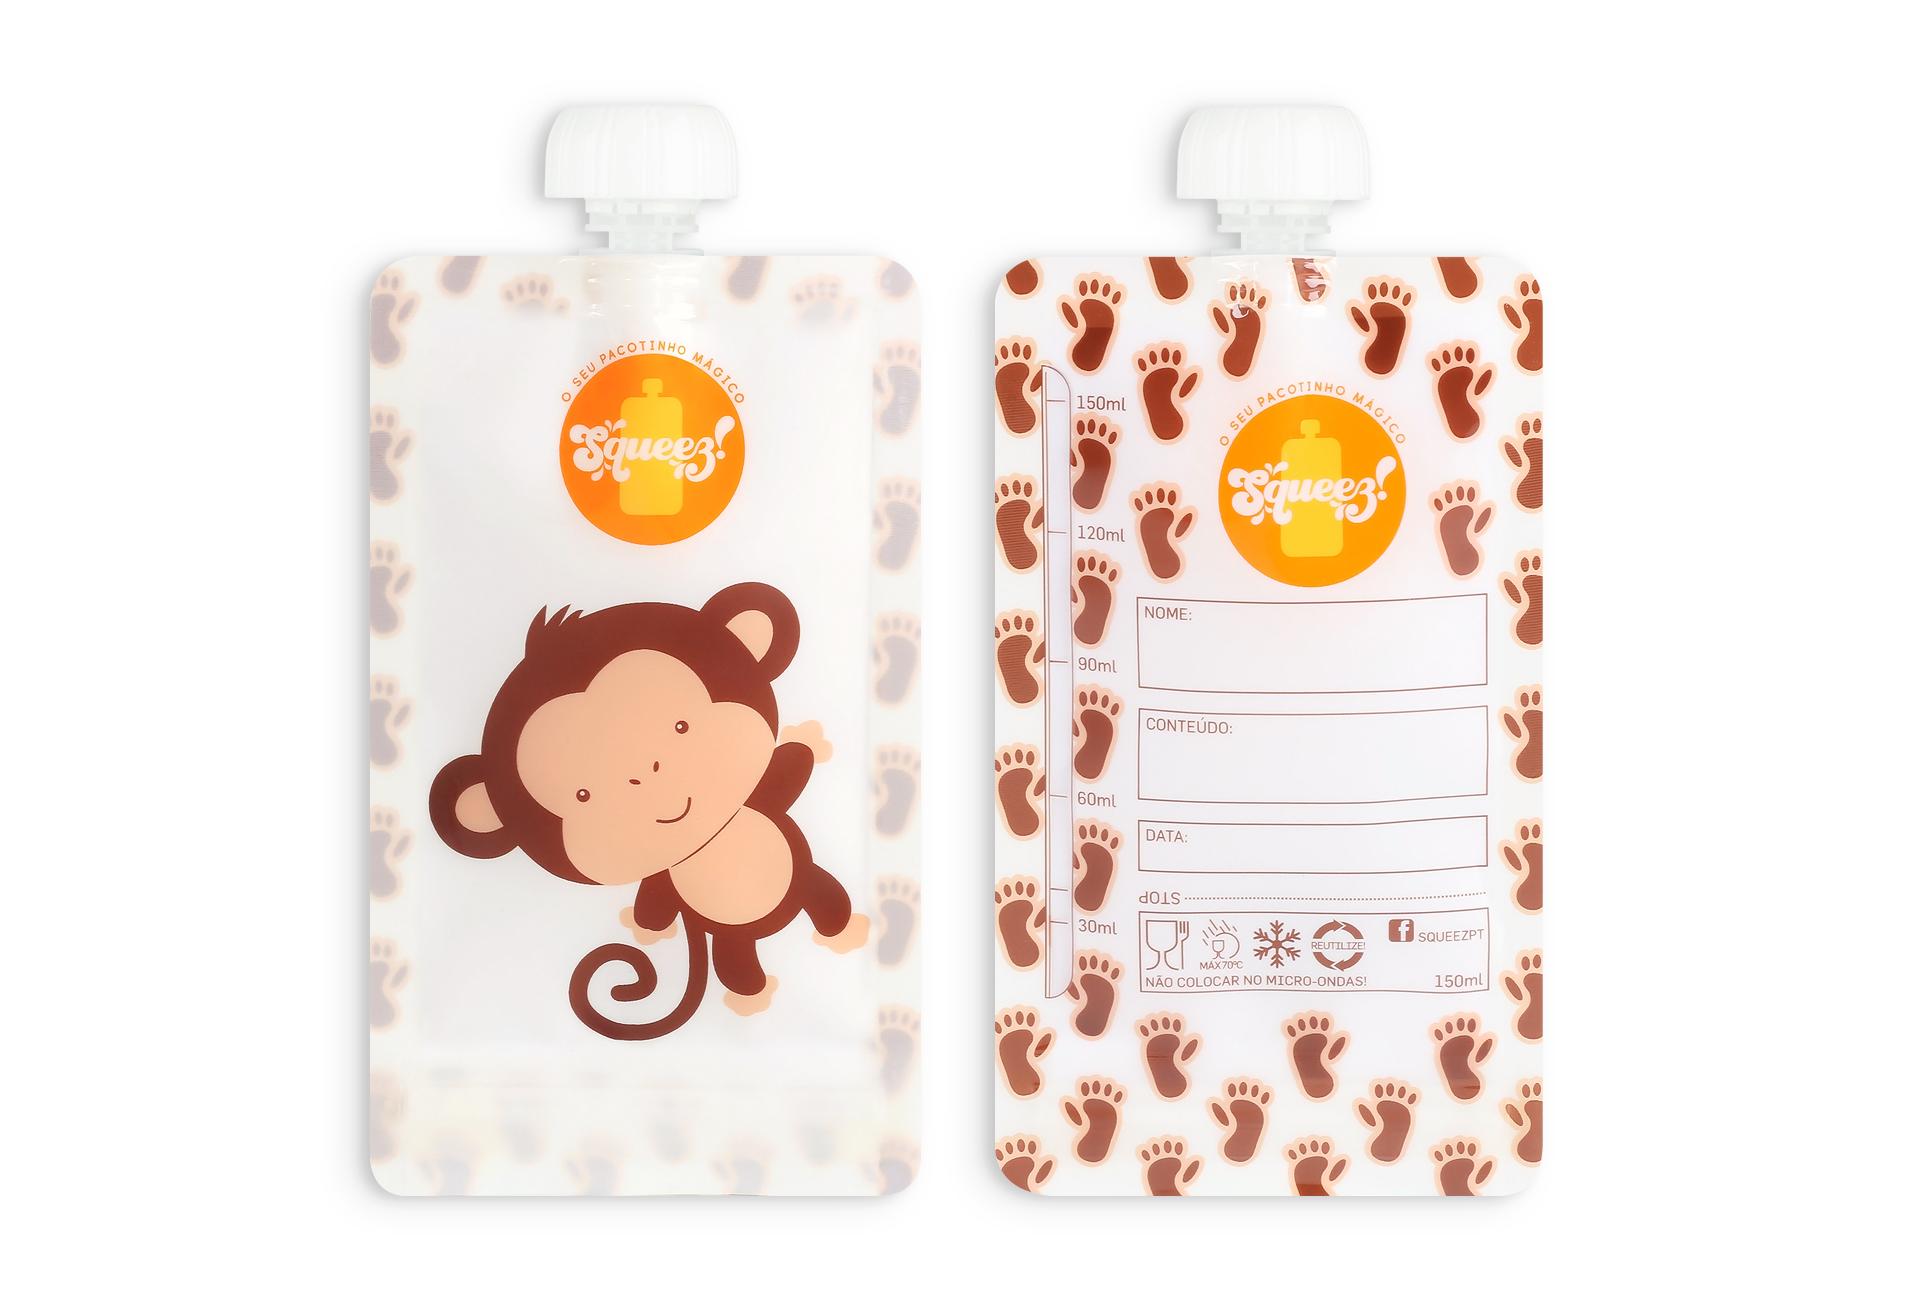 Pack 8 Pacotes reutilizáveis Squeez! 4 Girafas + 4 Macaco ou Elefante 150ml